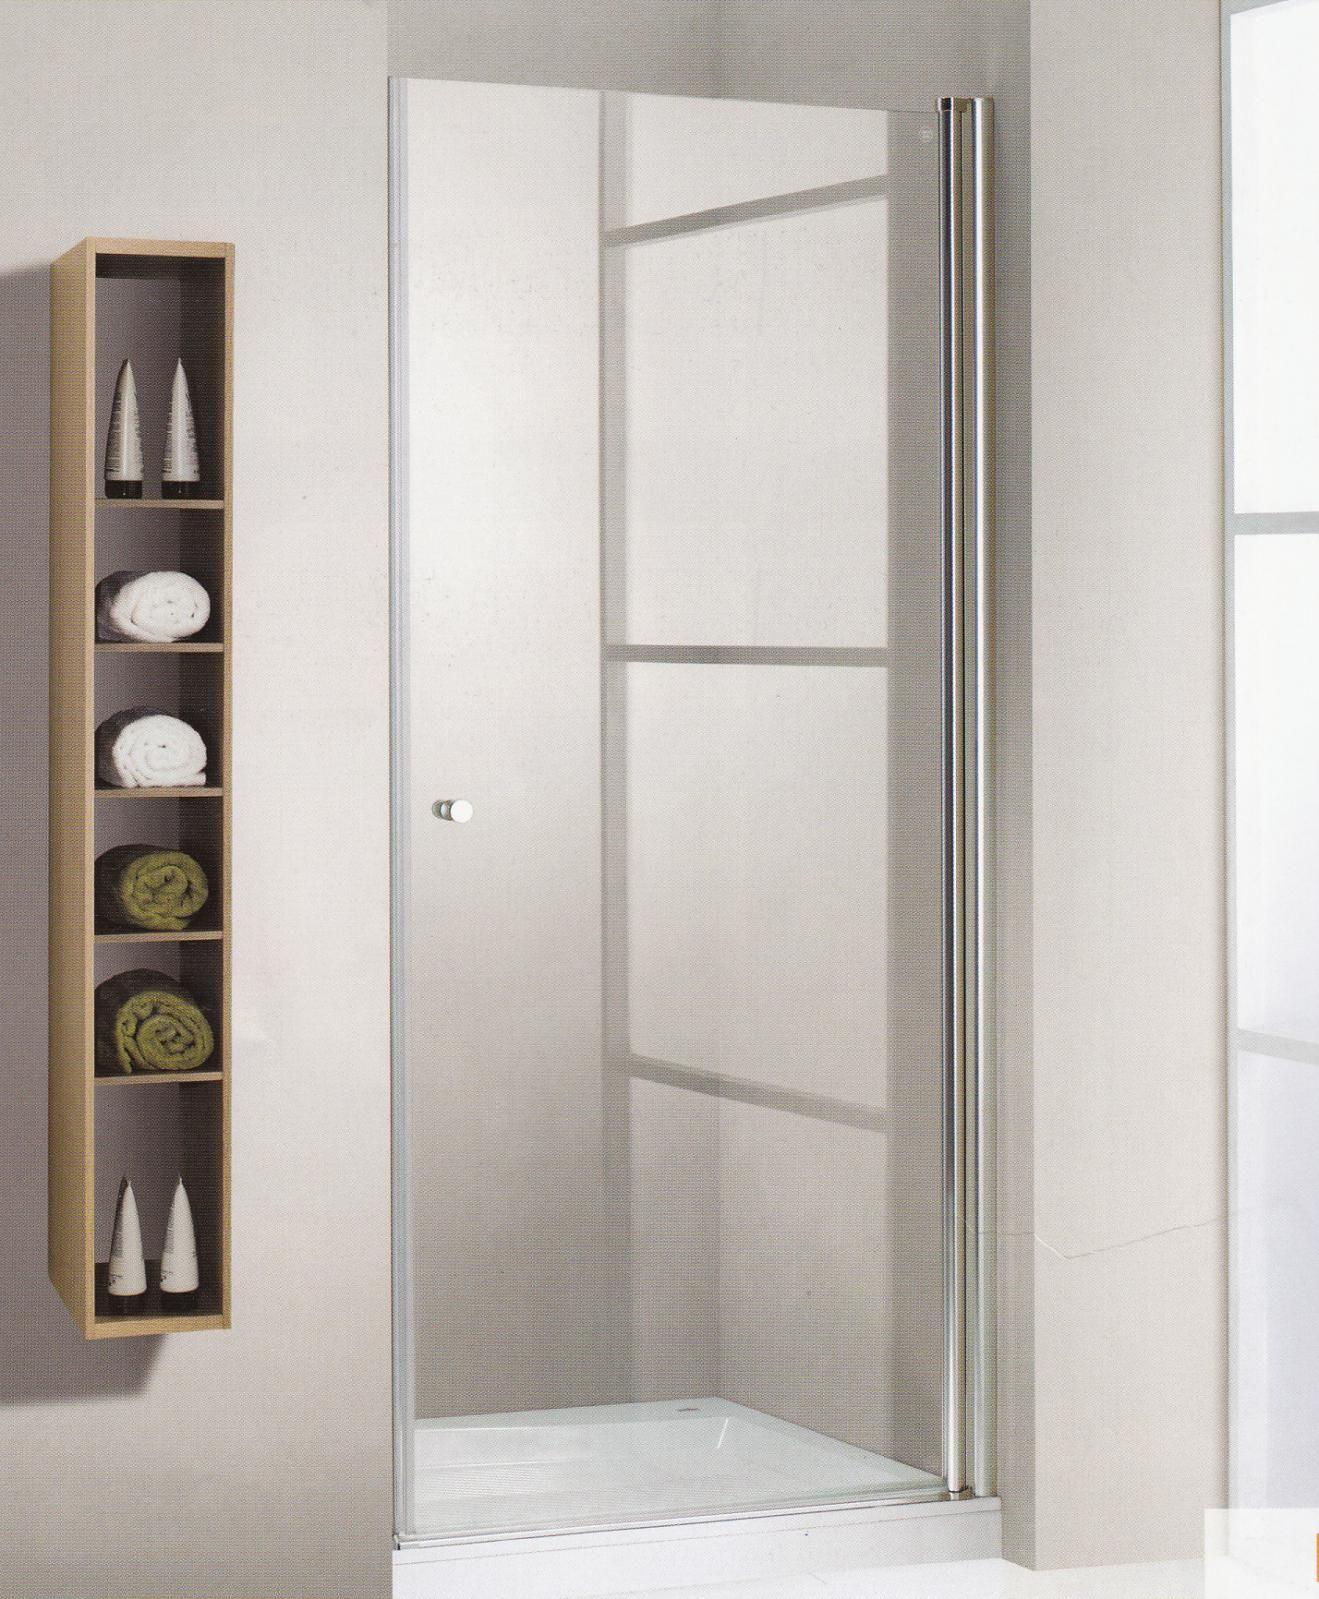 Fabricaci n a medida mampara frontal ducha 1 puerta for Medidas puertas interior